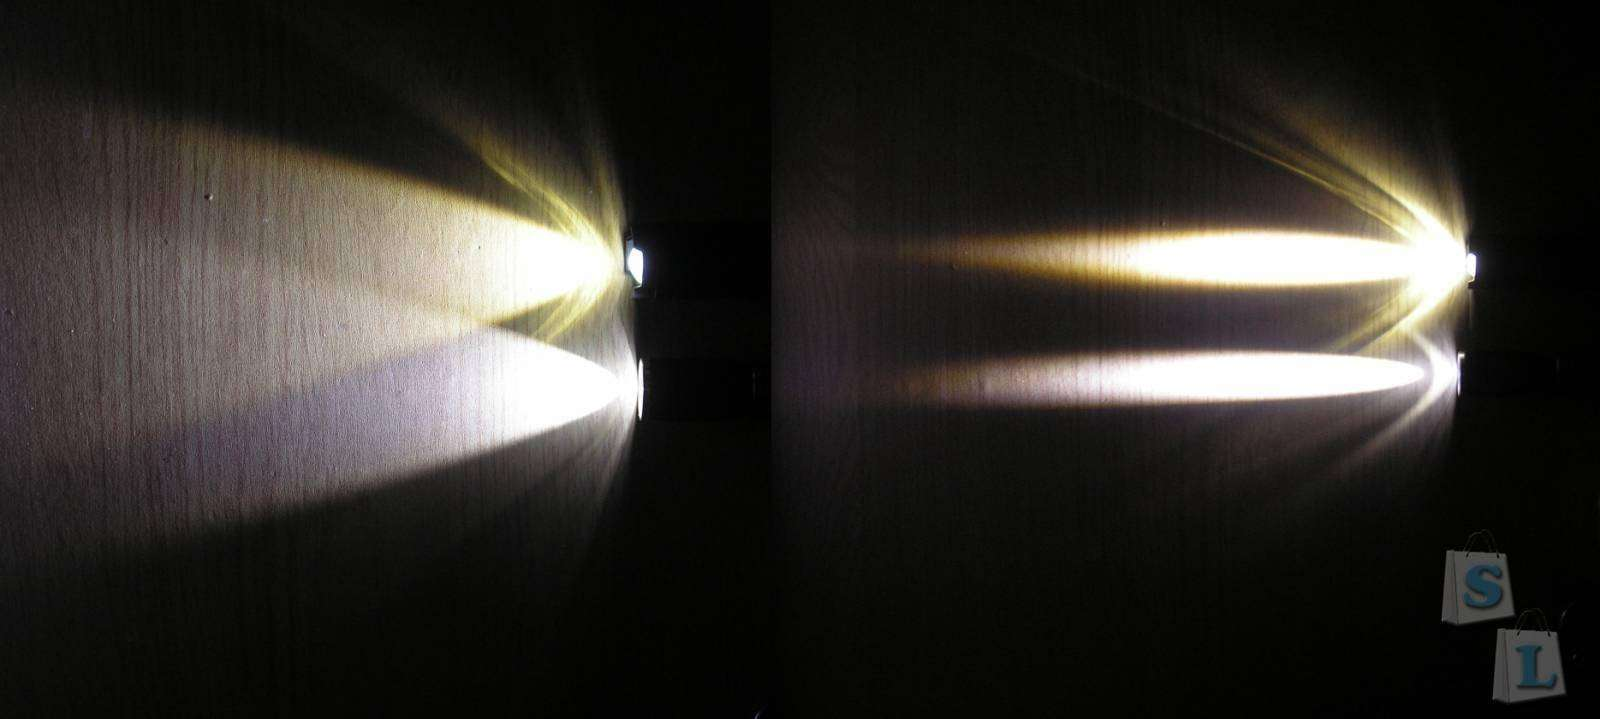 TinyDeal: Фонарик SK68 CREE Q5 3W 1-Mode Zoom (1 x AA)